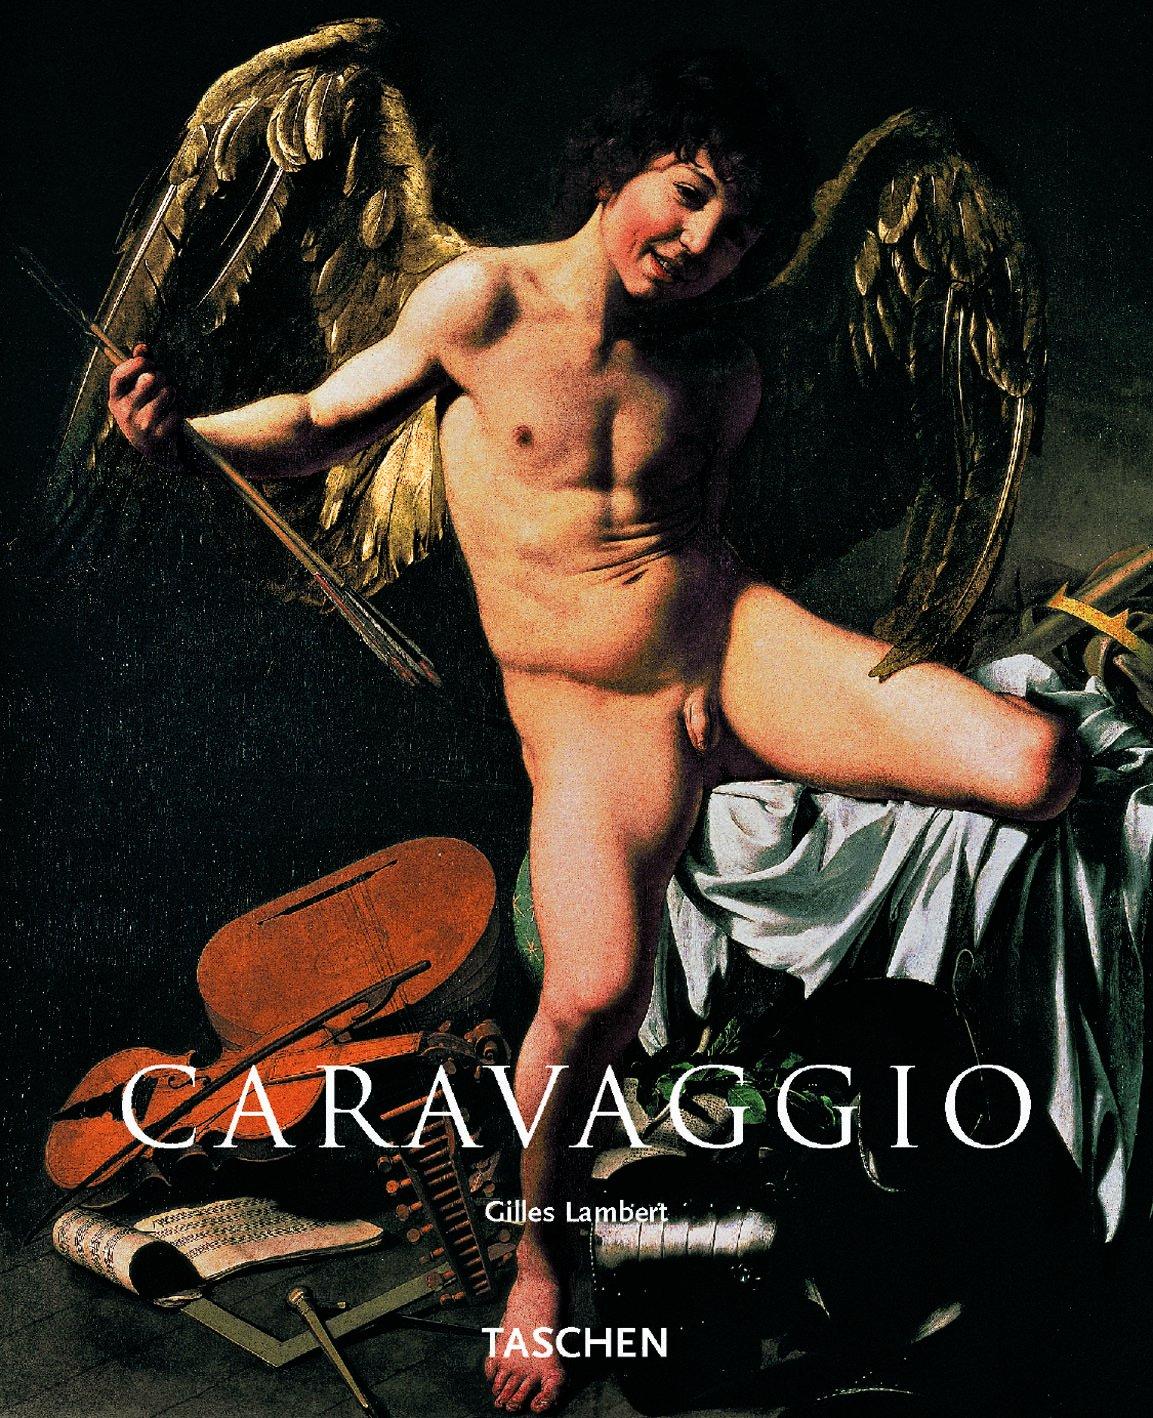 Caravaggio. Ediz. illustrata Copertina flessibile – 23 mar 2013 Gilles Lambert Taschen 3822859311 Architects